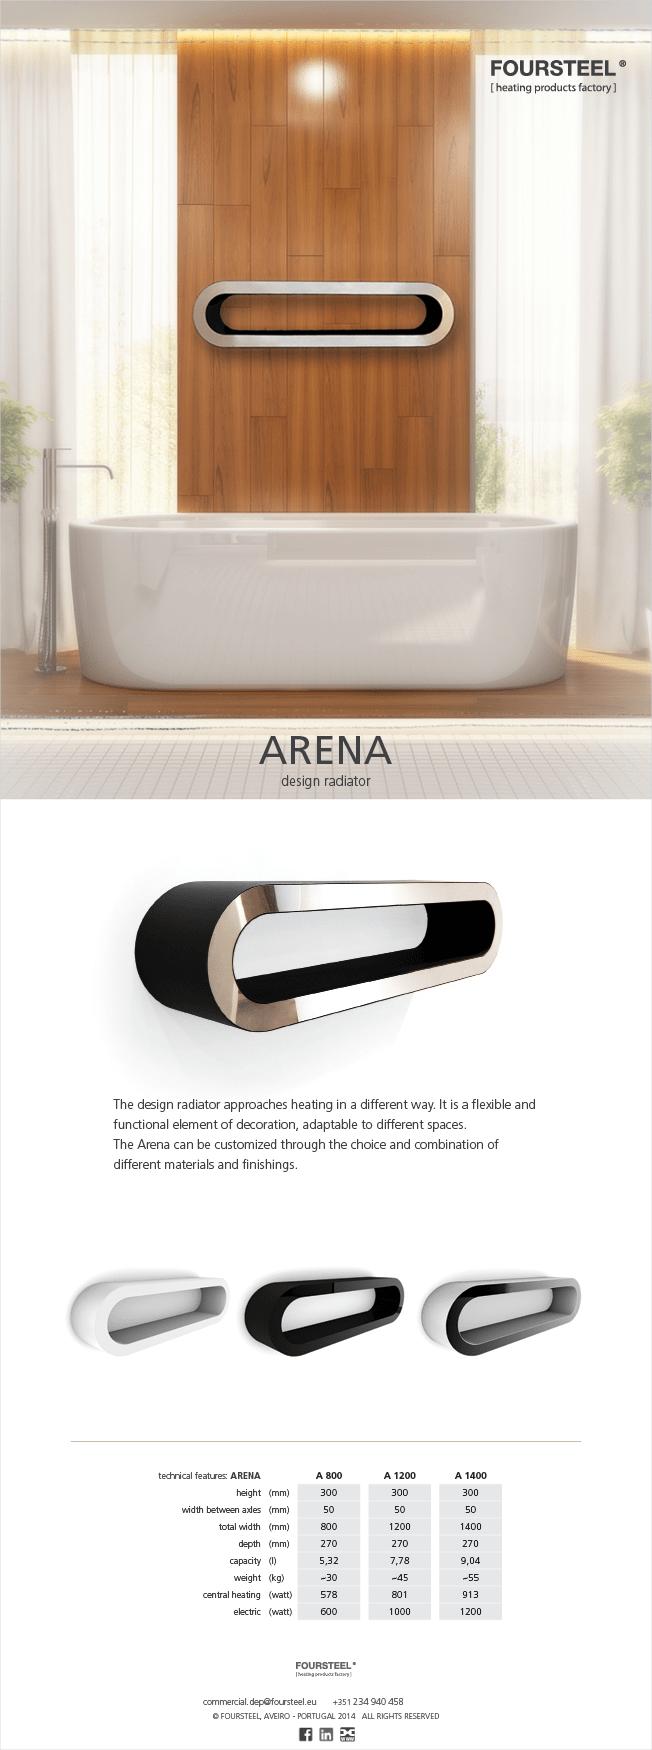 arena - abr 2014